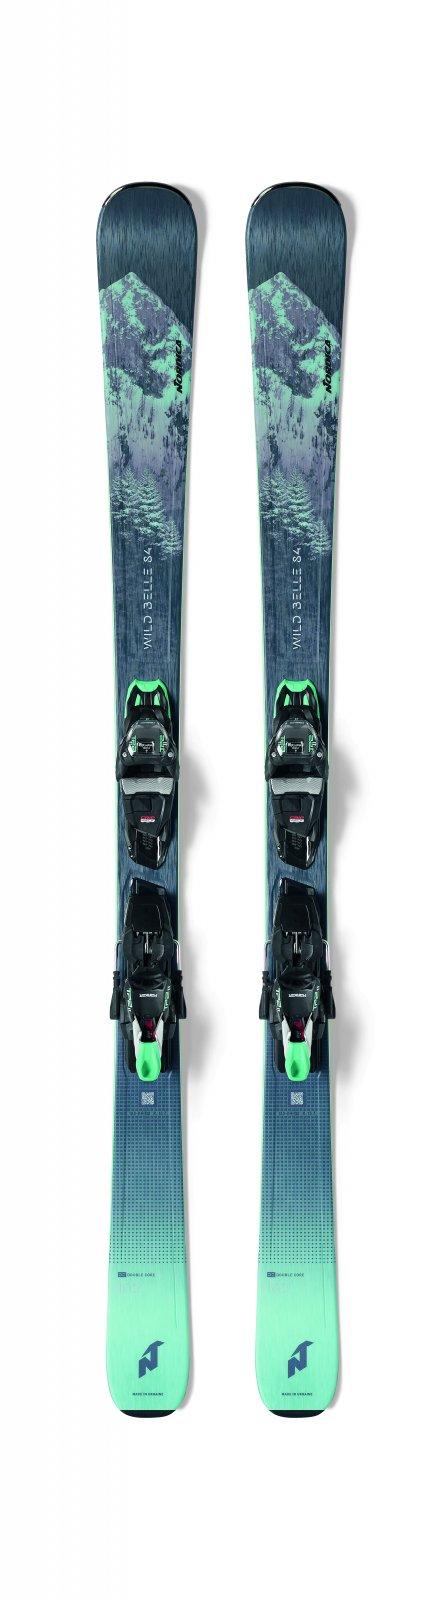 2022 Nordica Wild Belle 84 w/ Marker TP2 Light 11 Women's Ski Package